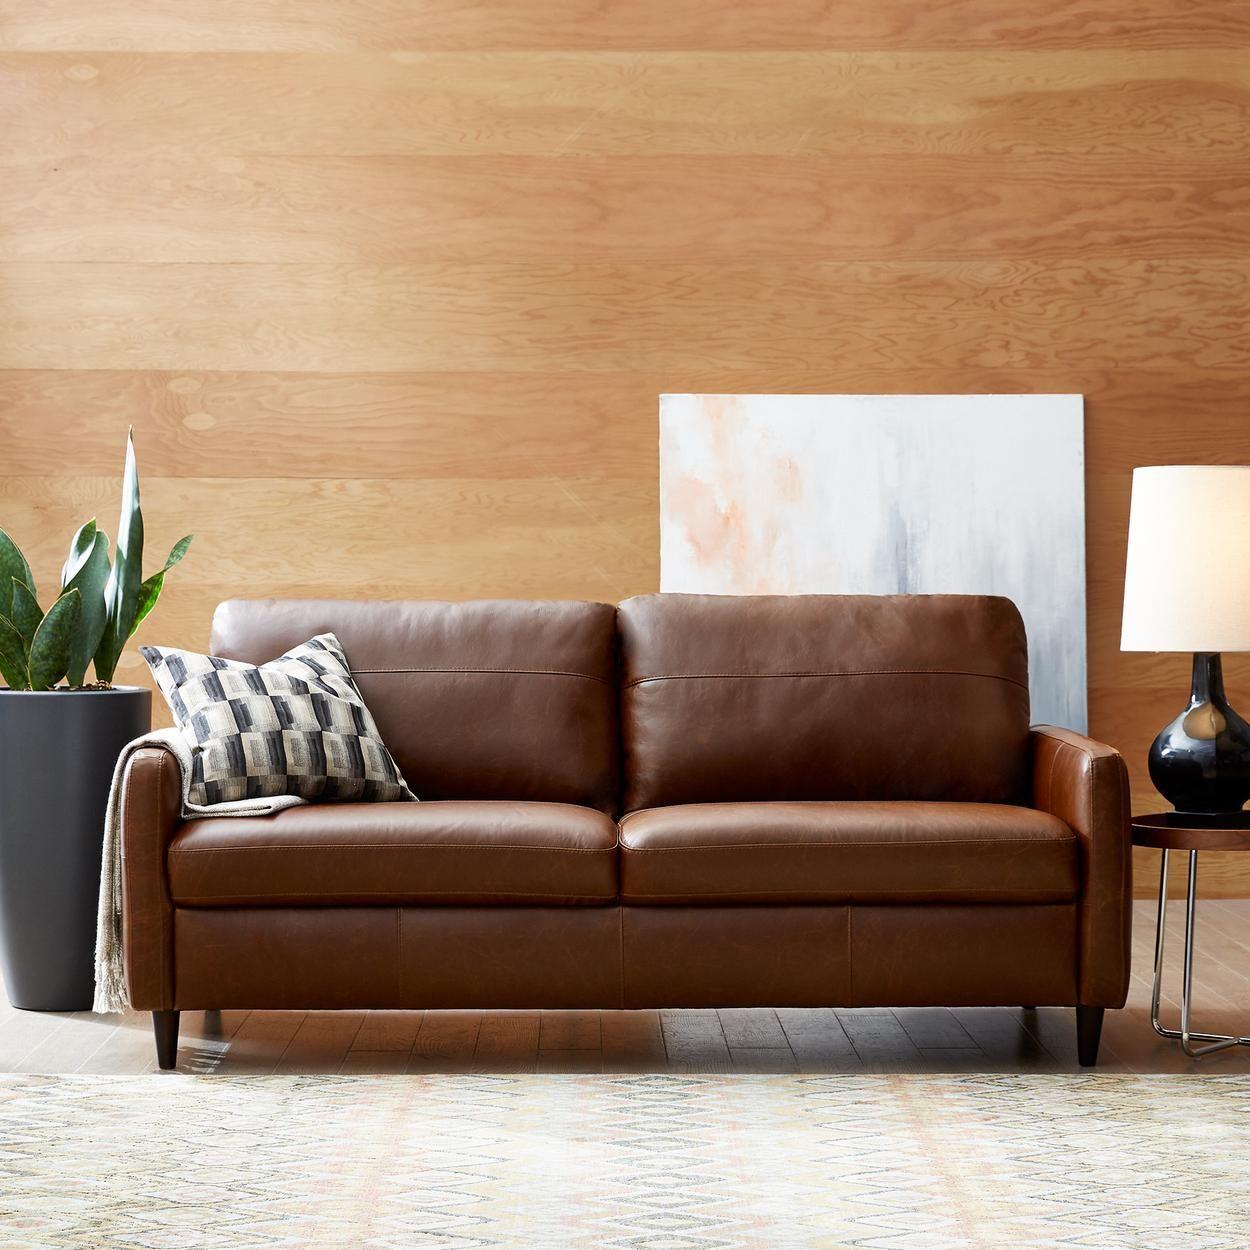 Buy alessa sofa online reviews furniture pinterest buy alessa sofa online reviews parisarafo Images